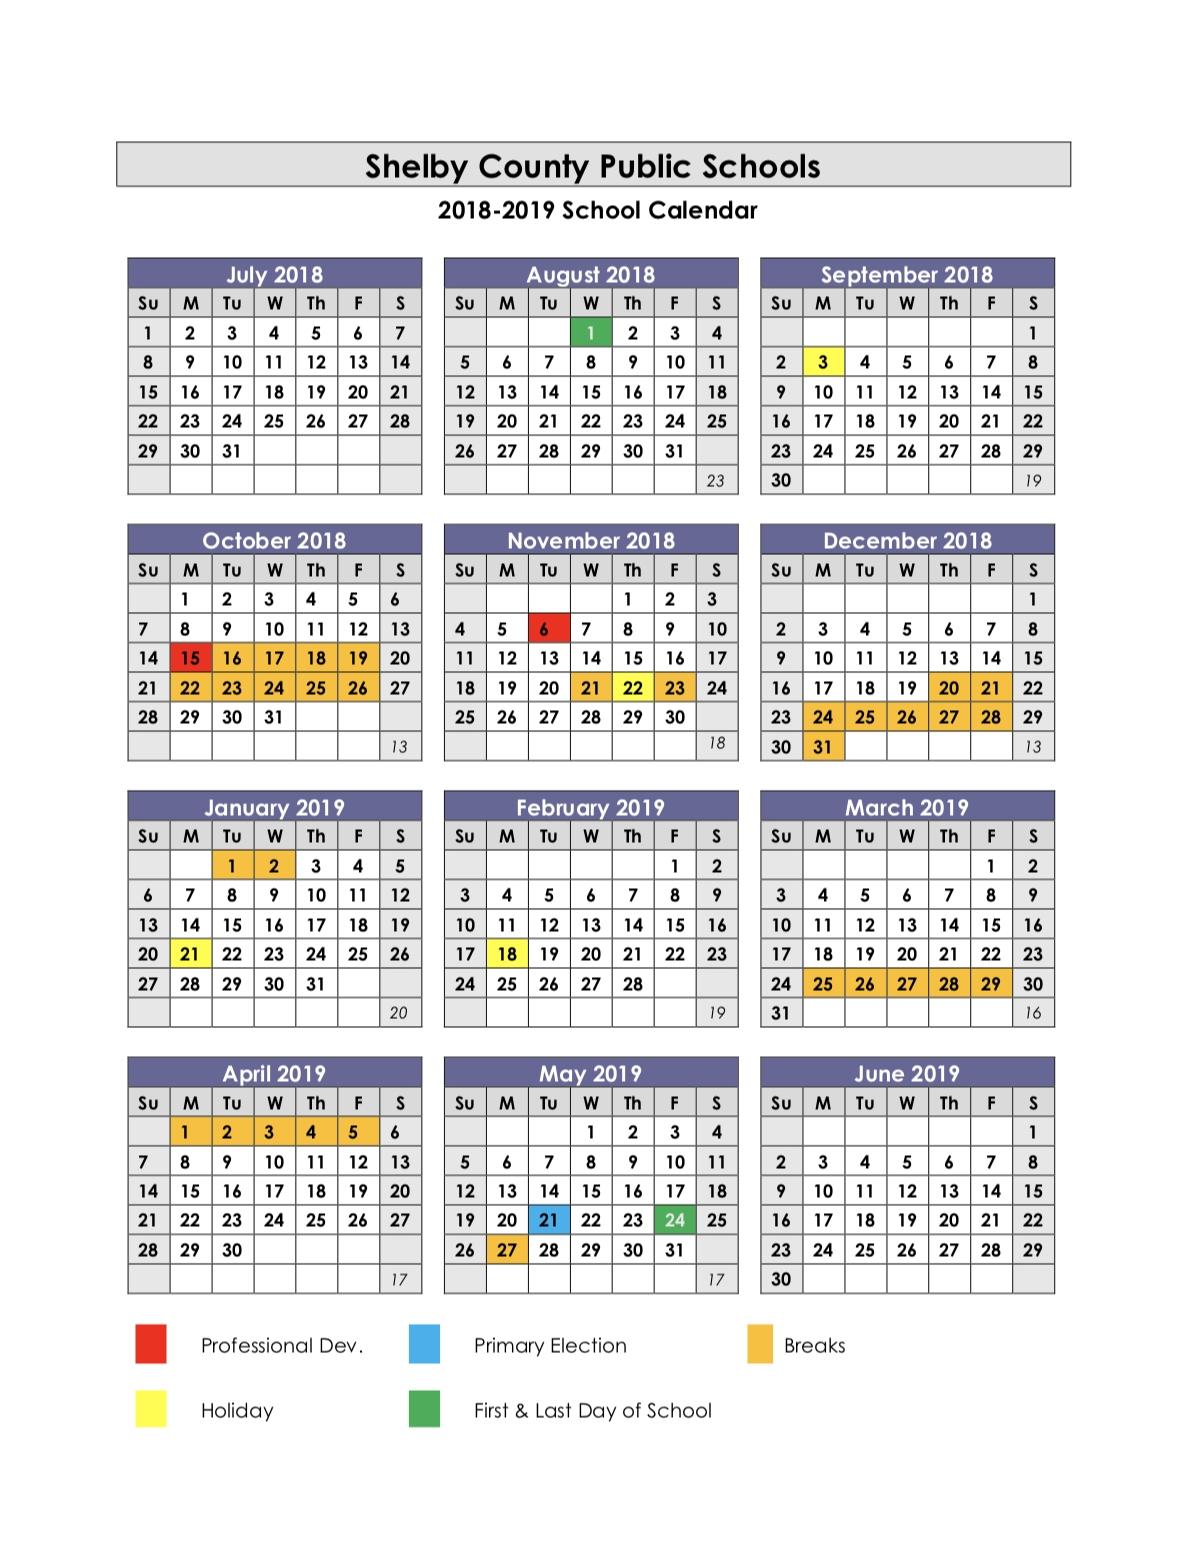 School Year Calendars / 2018 2019 School Calendar Calendar 2019 19